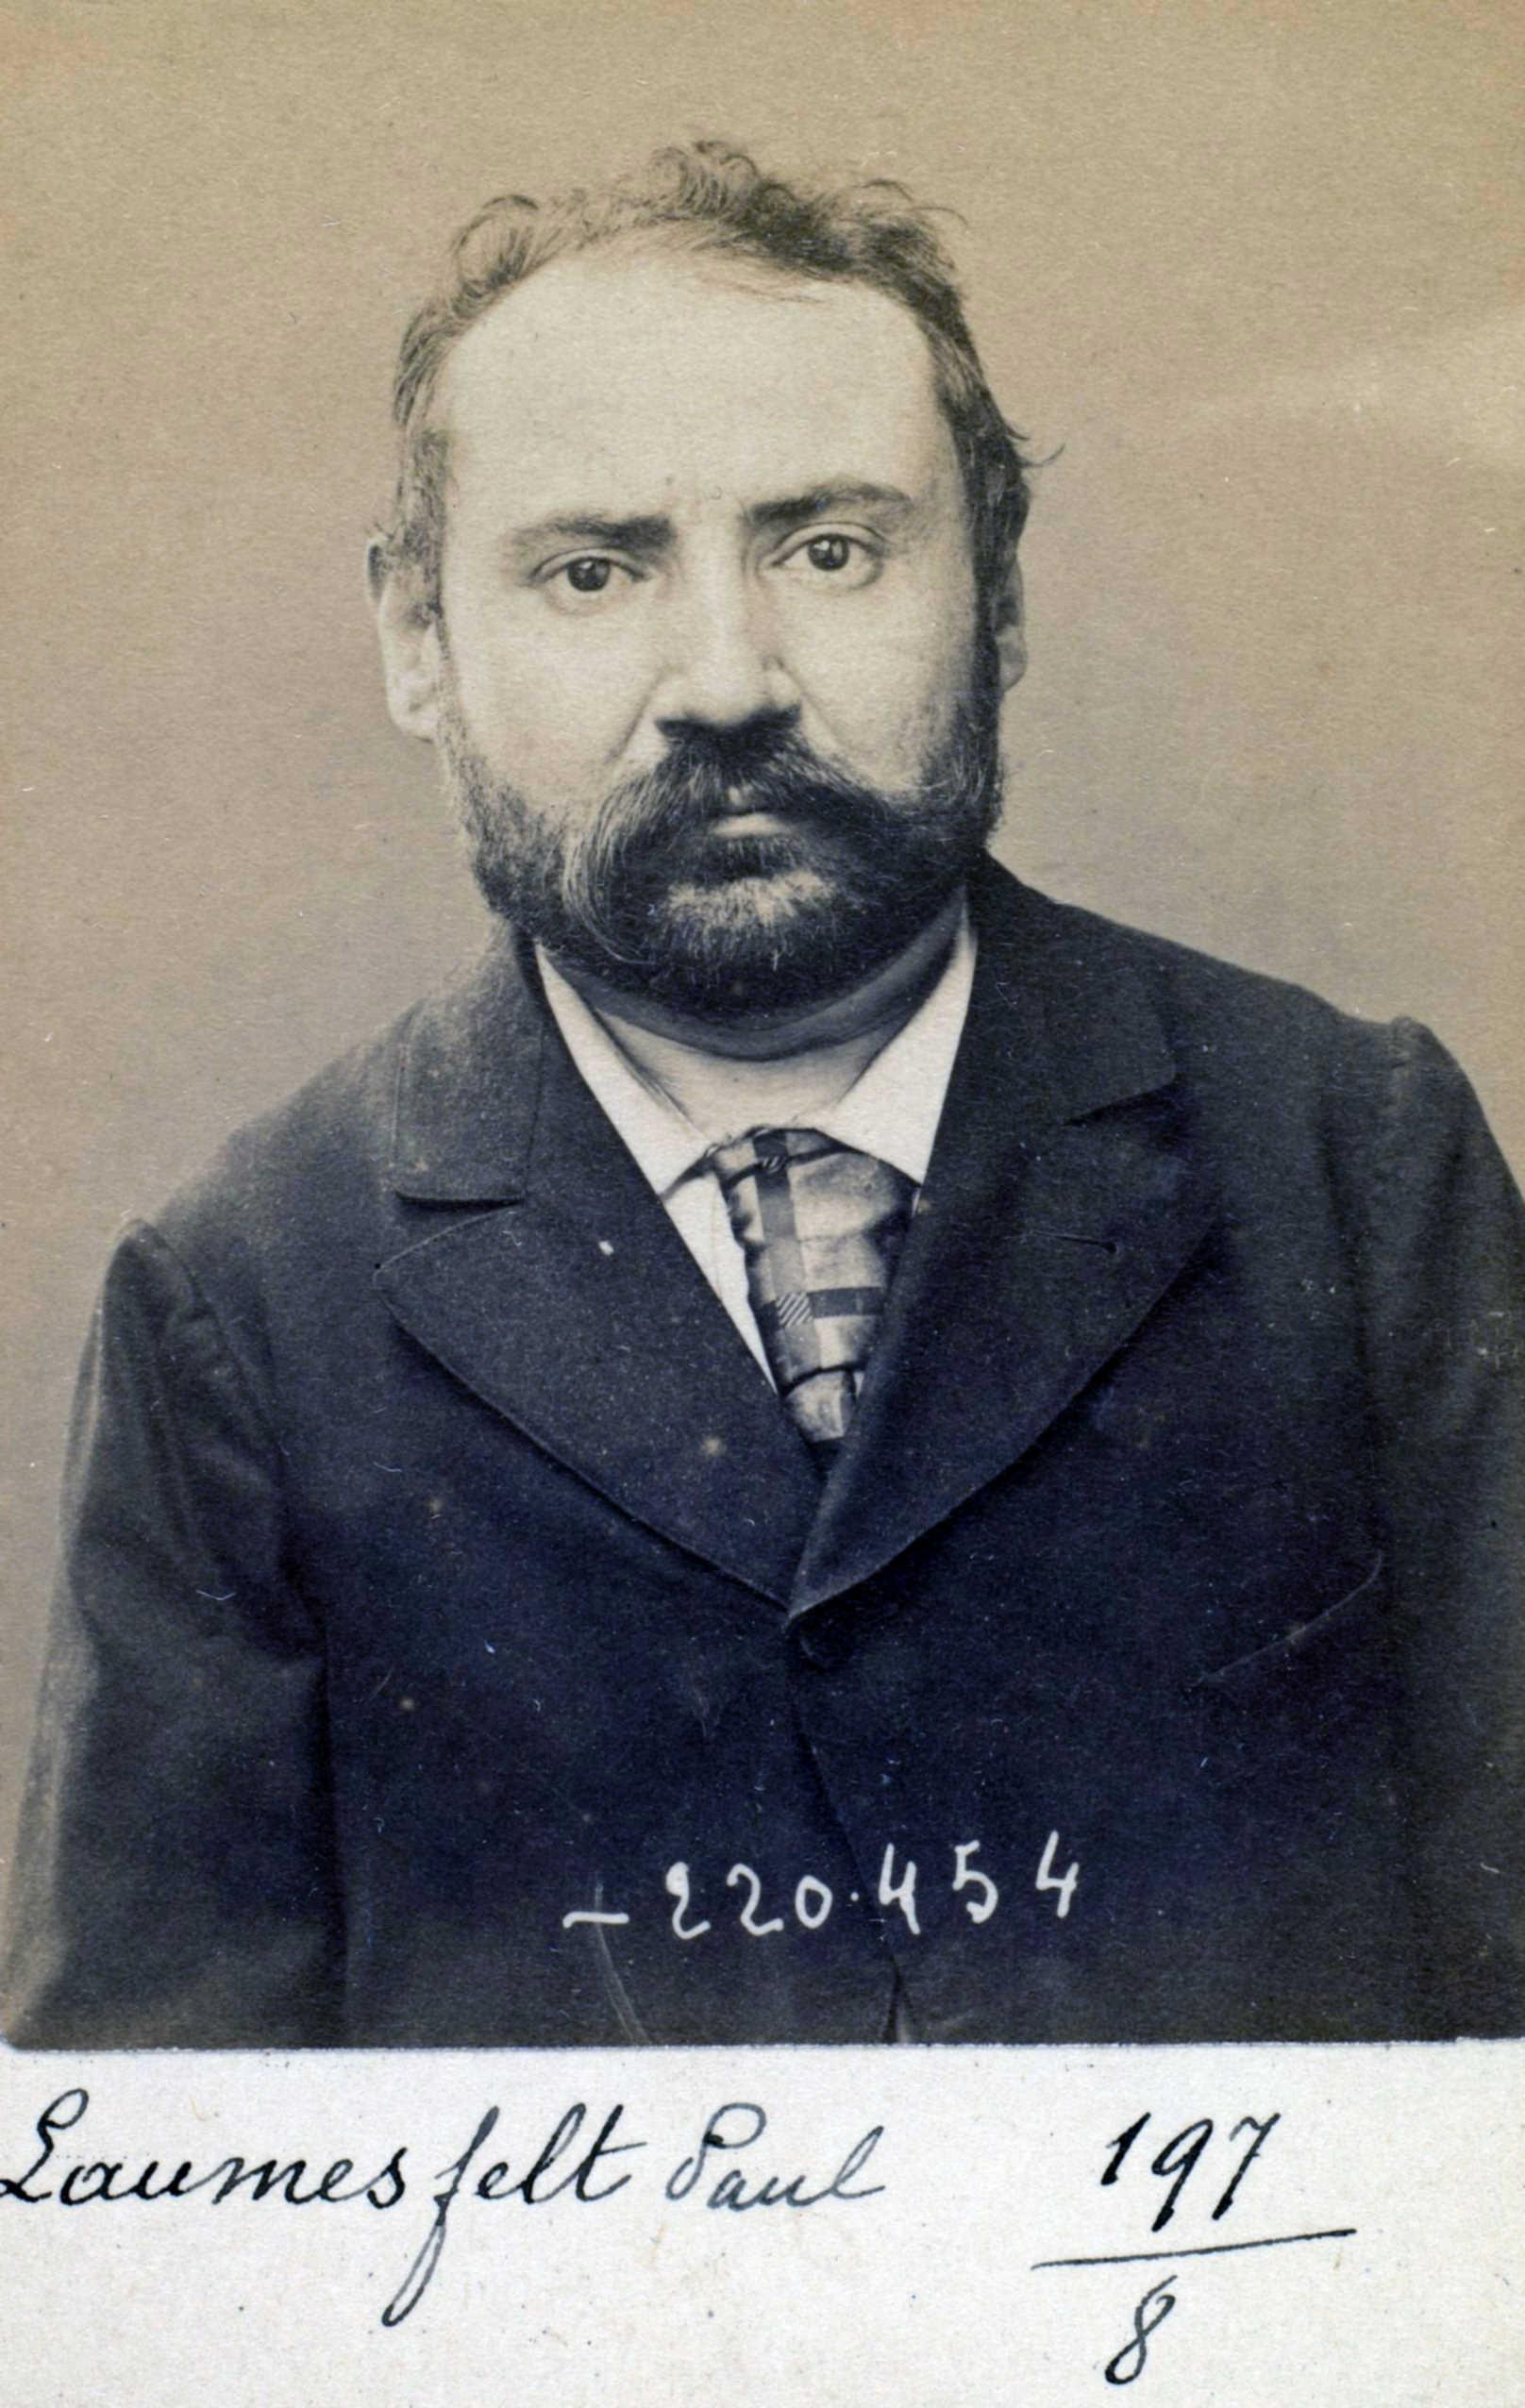 Foto policíaca de Paul Mathias Laumesfelt (2 de juliol de 1894)